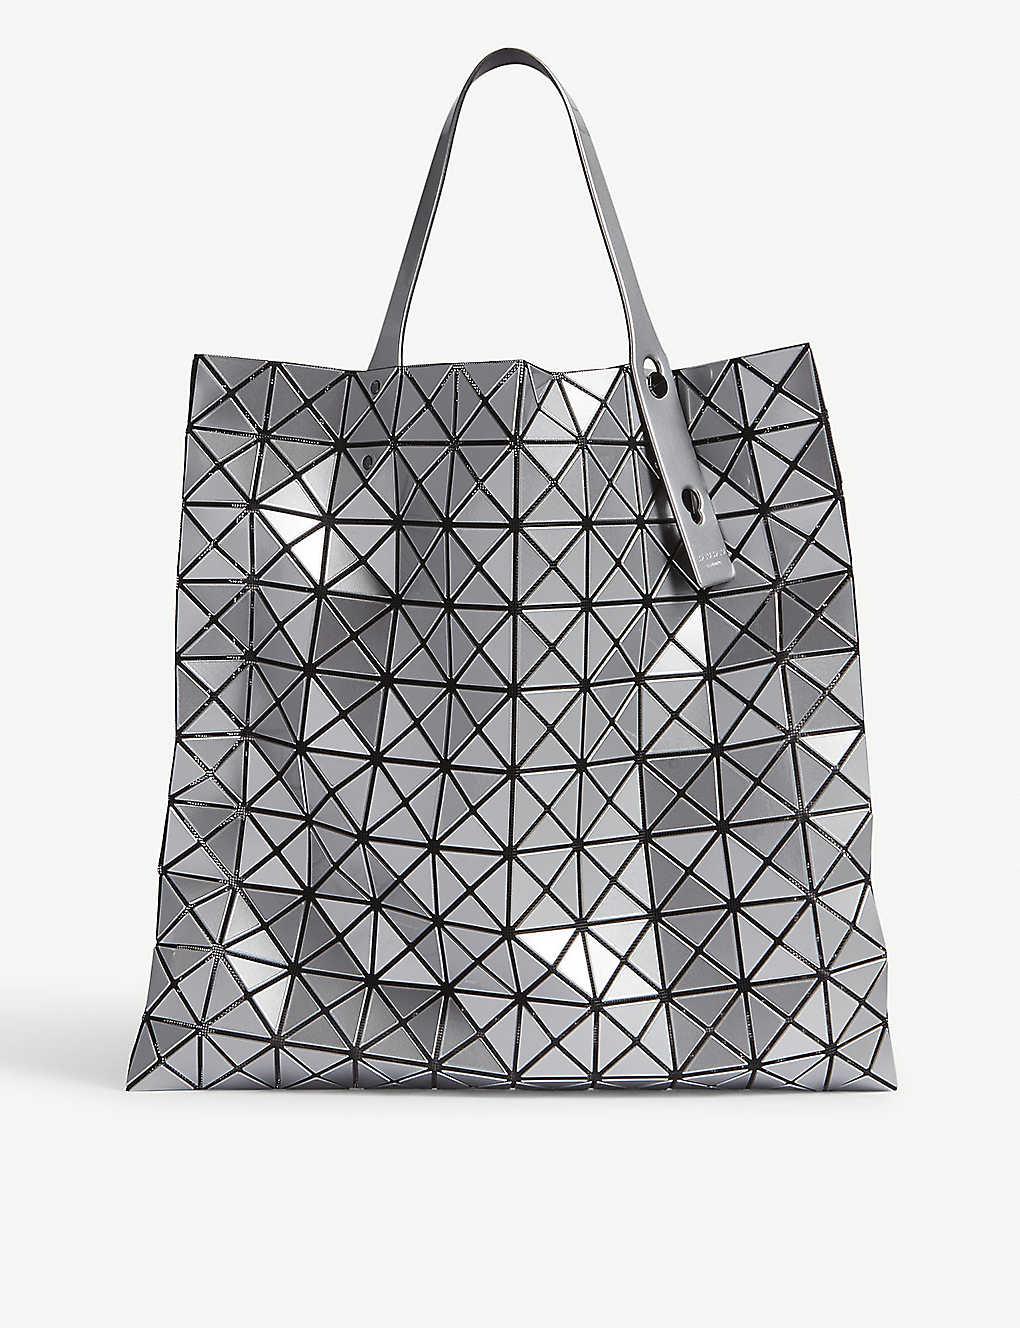 7f527ec8cc78 BAO BAO ISSEY MIYAKE - Prism metallic tote bag